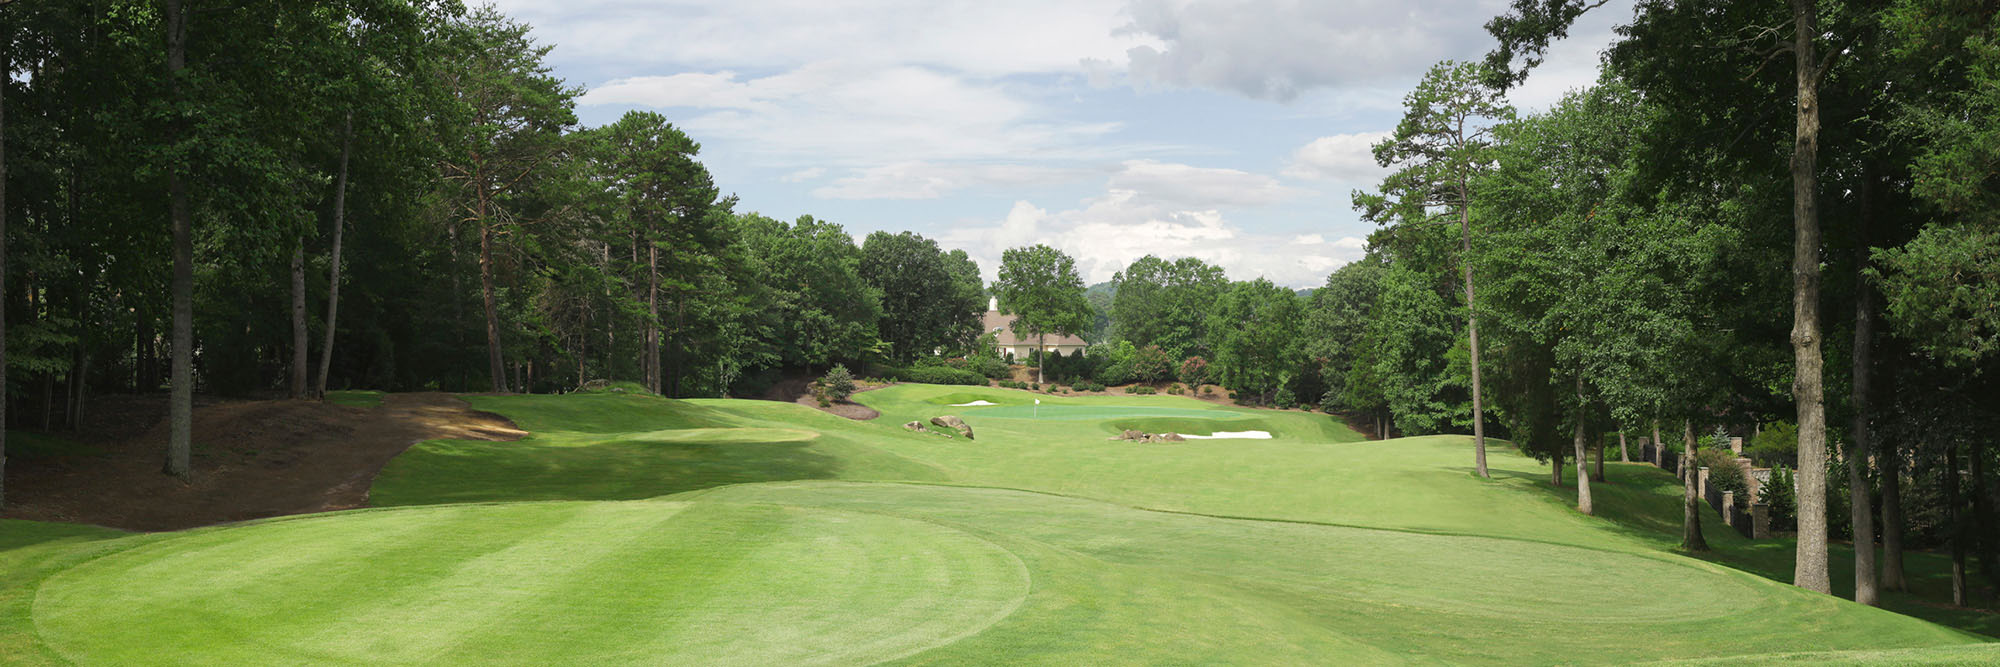 Golf Course Image - River Run Country Club No. 17